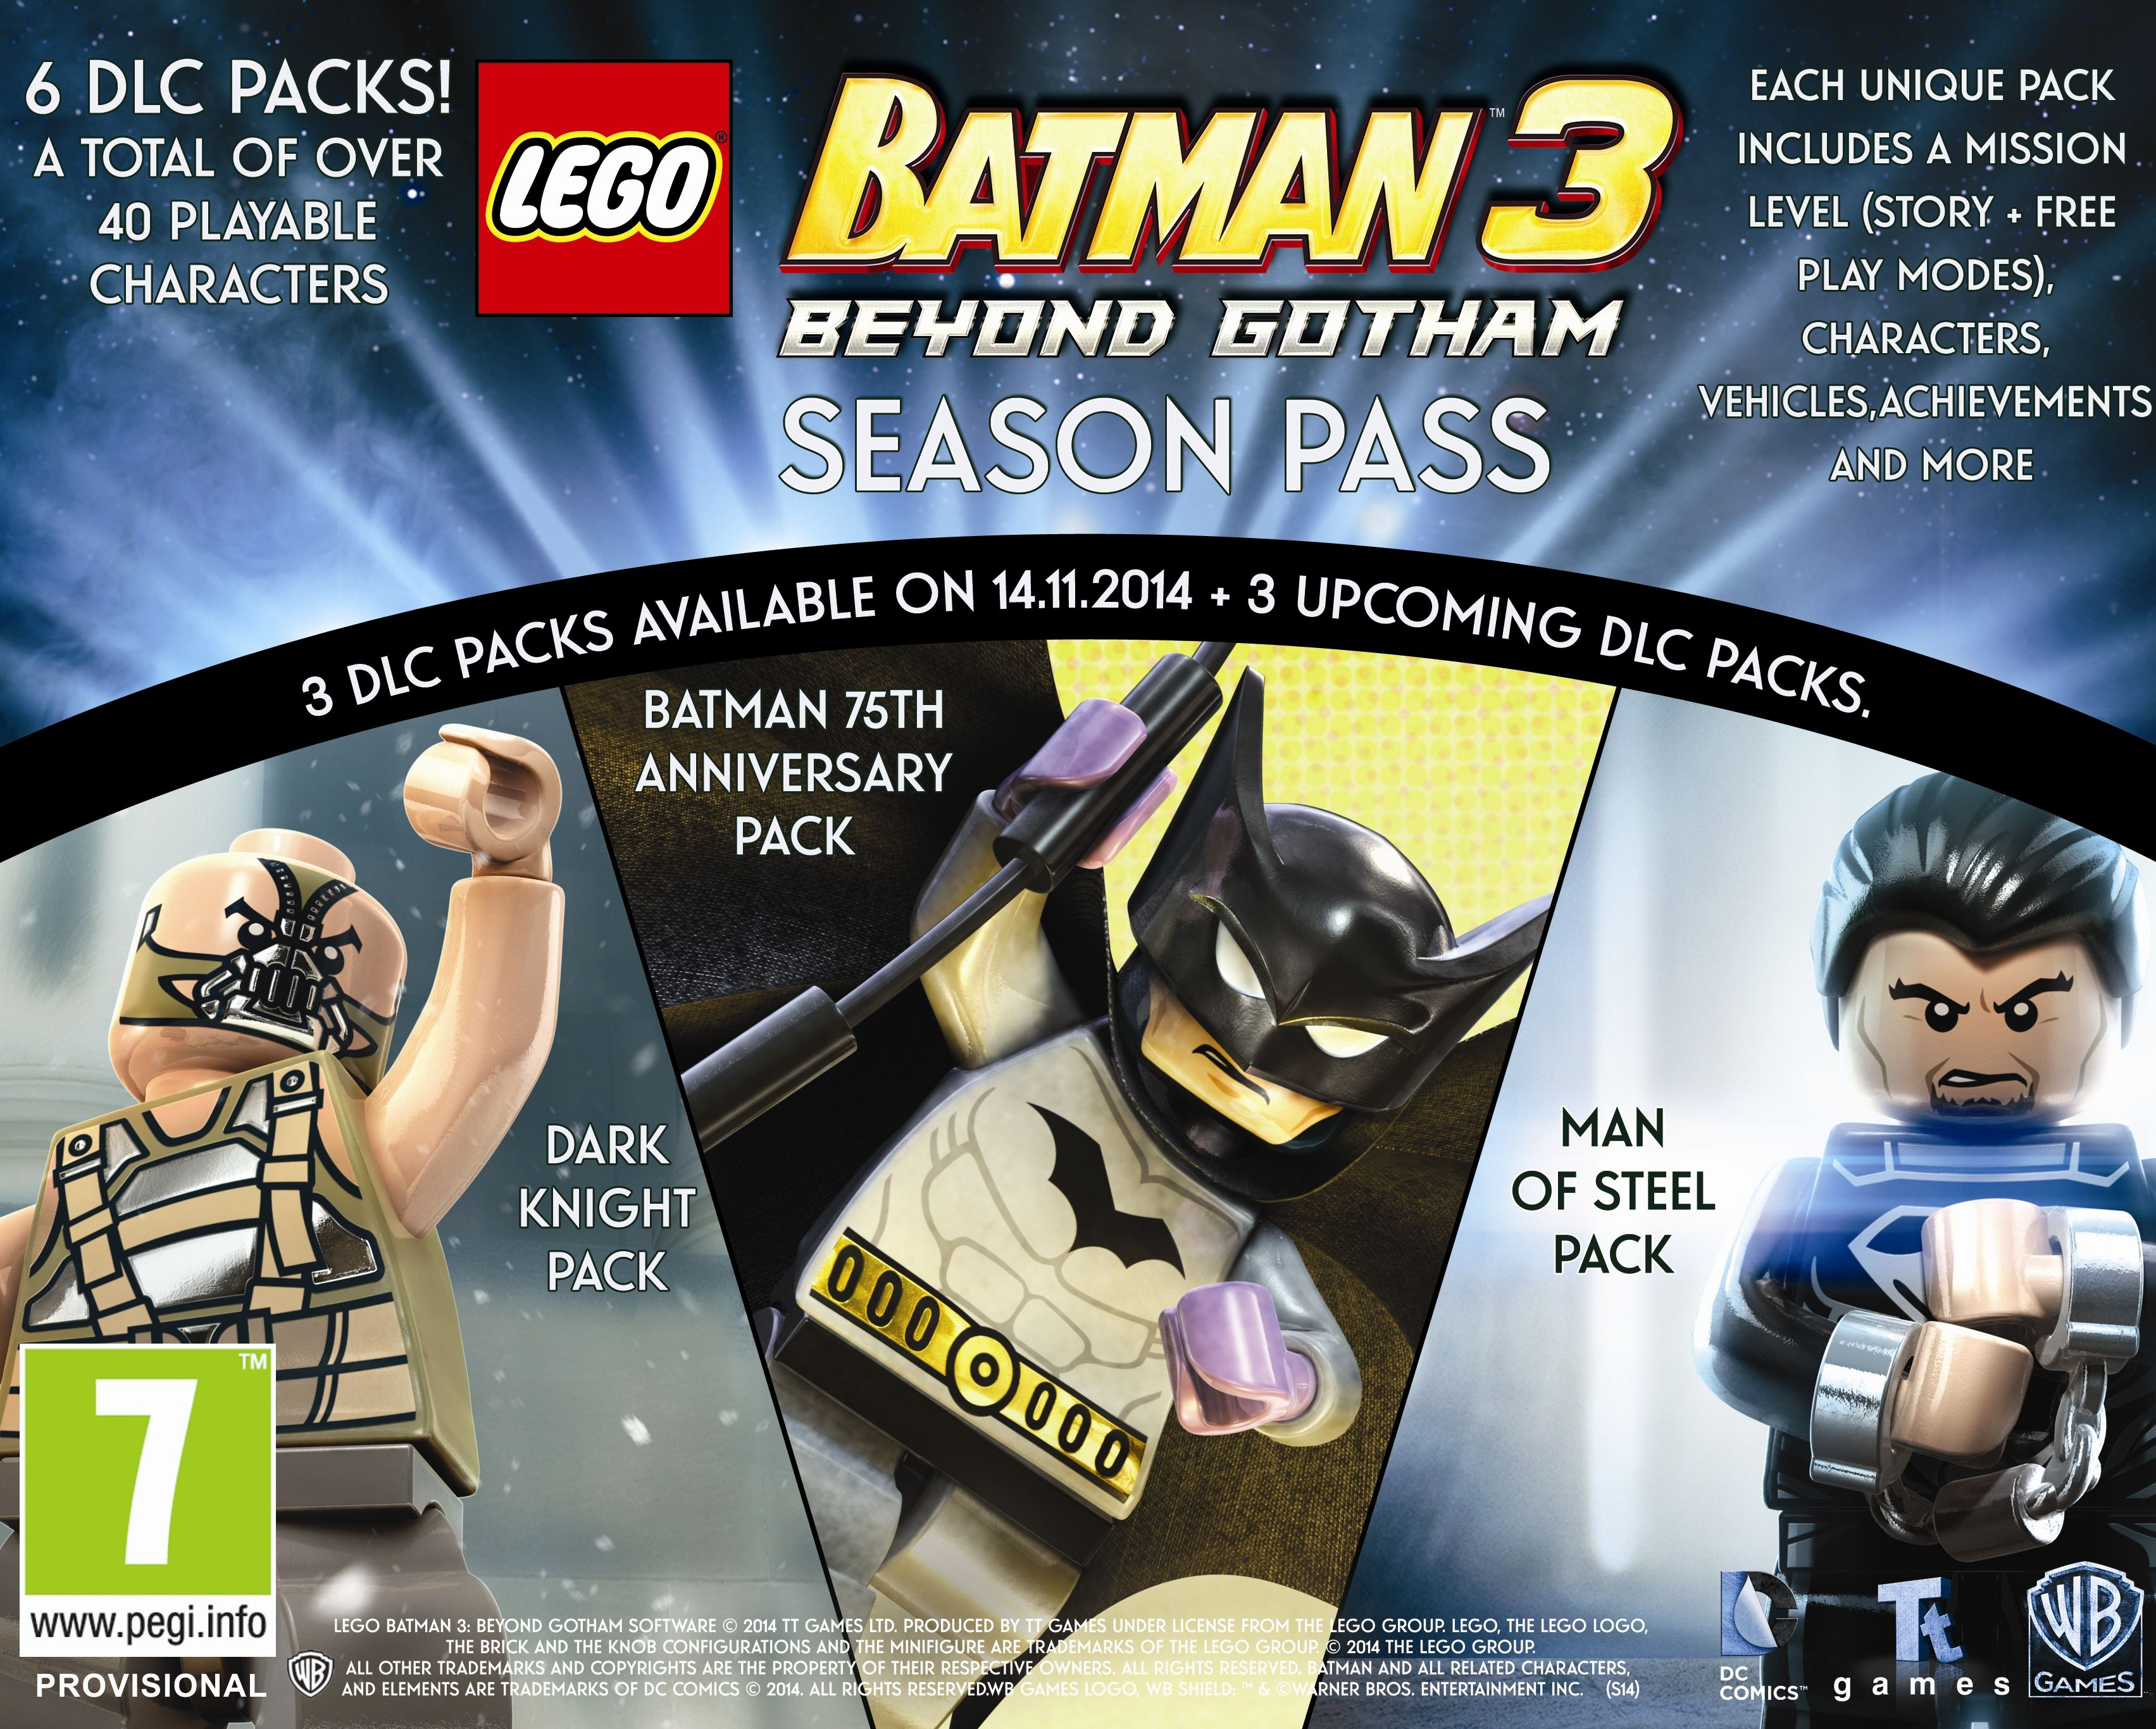 LEGO Batman 3: Beyond Gotham DLC Season Pass Skips Wii U, 3DS, and PS Vita